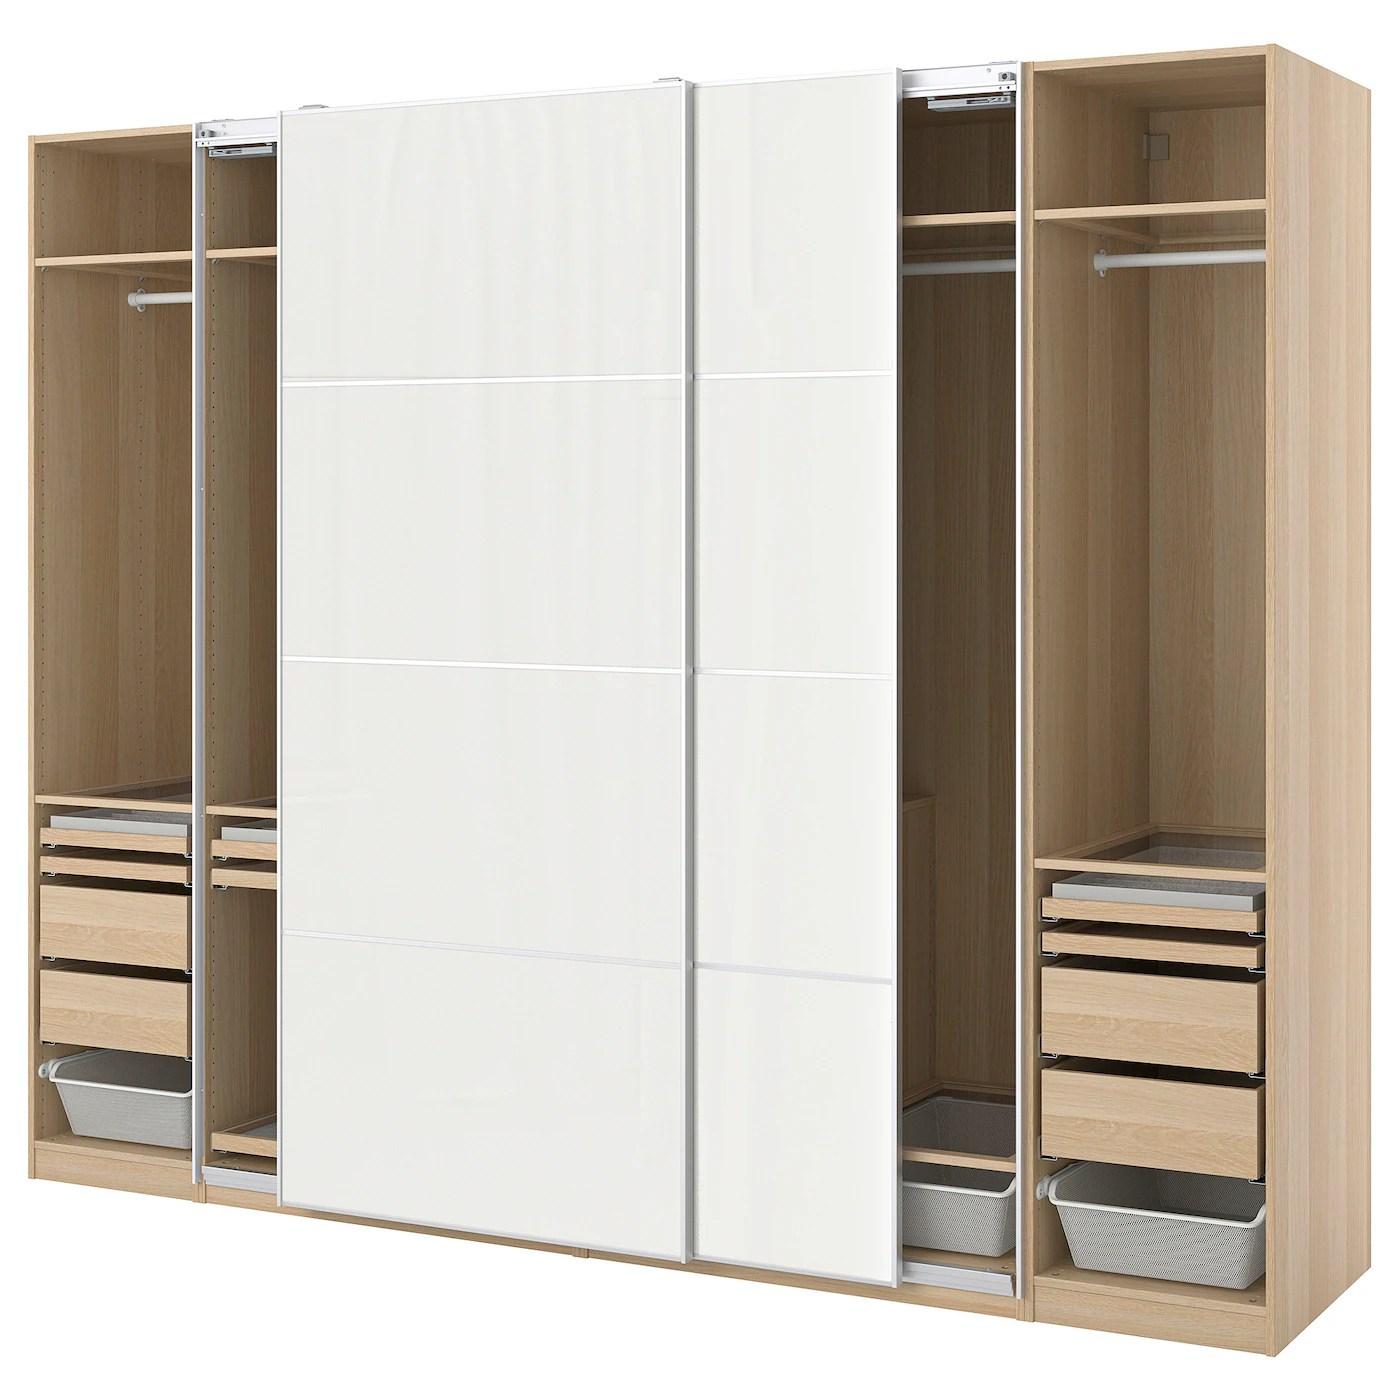 pax hokksund combinaison armoire effet chene blanchi gris clair brillant 300x66x236 cm